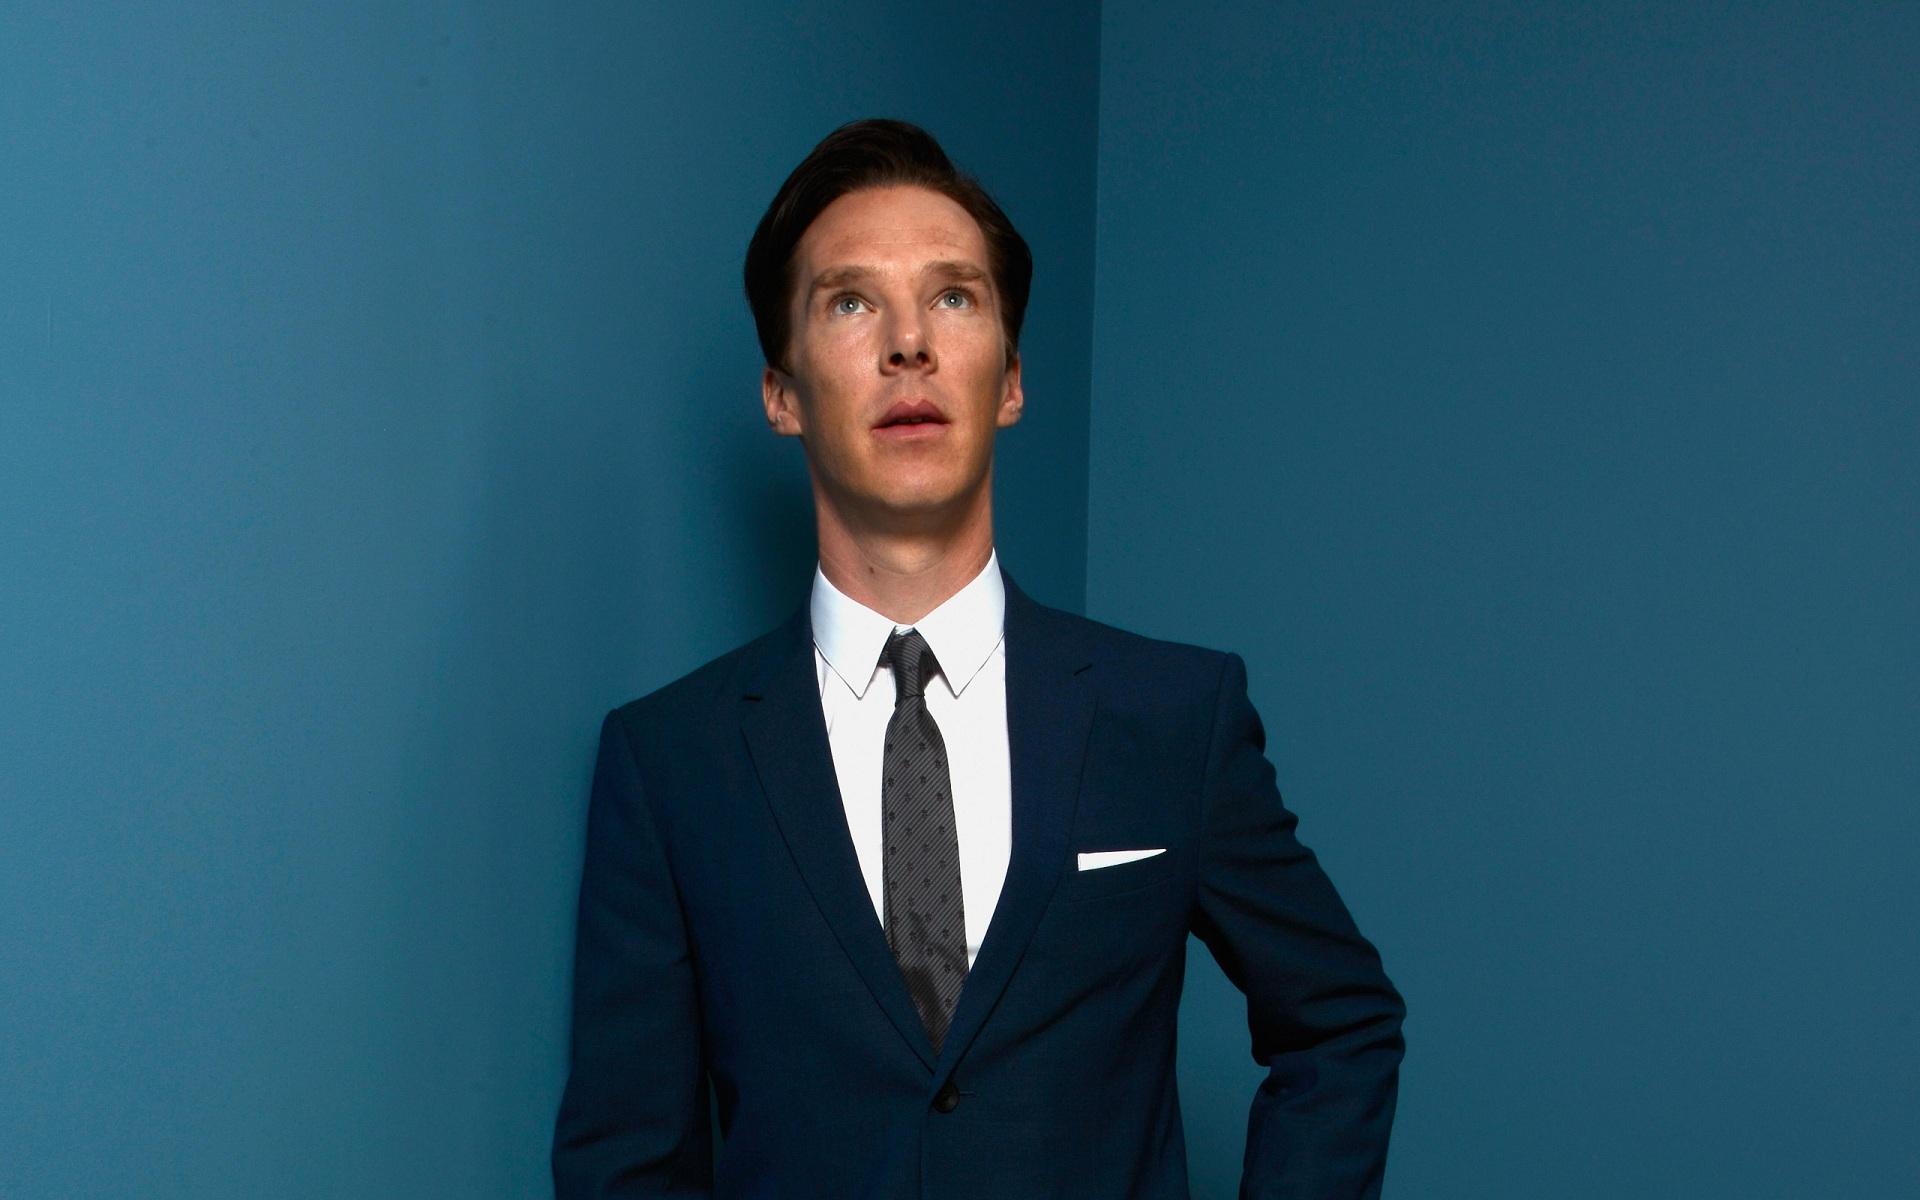 Benedict Cumberbatch Image - ID: 330453 - Image Abyss